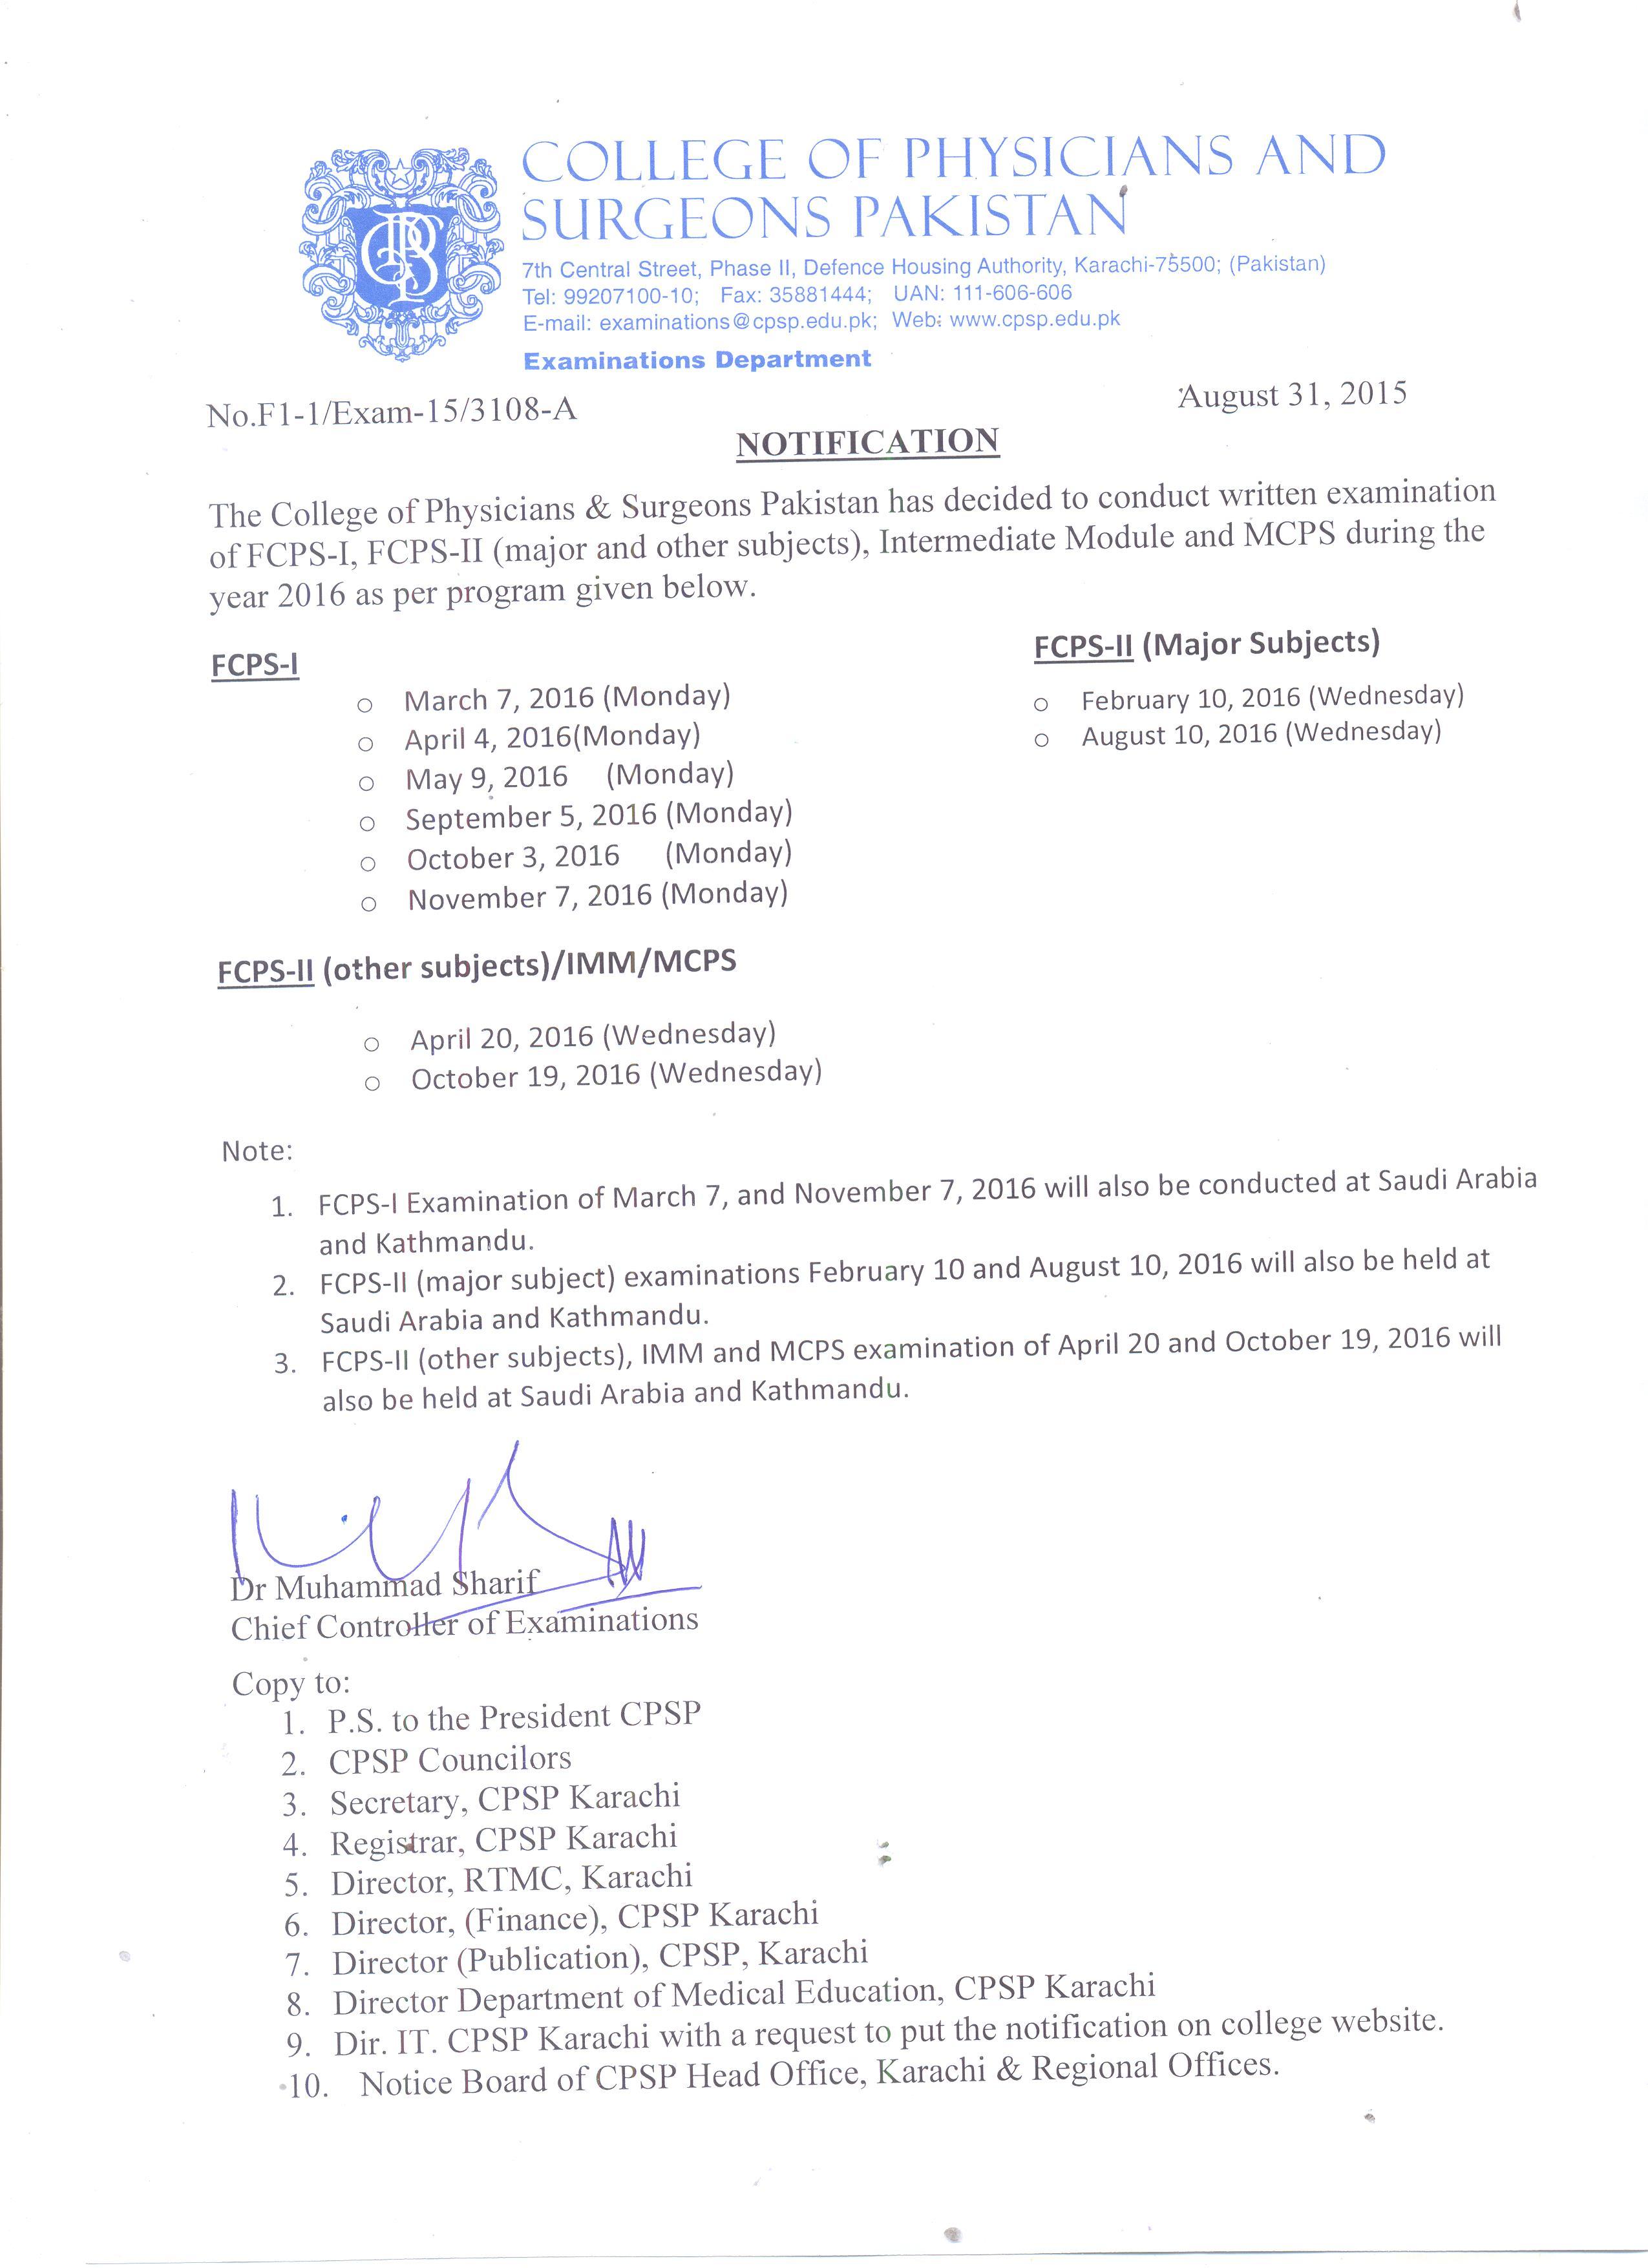 CPSP FCPS Part 1 & 2 Exam Schedule Calendar 2016